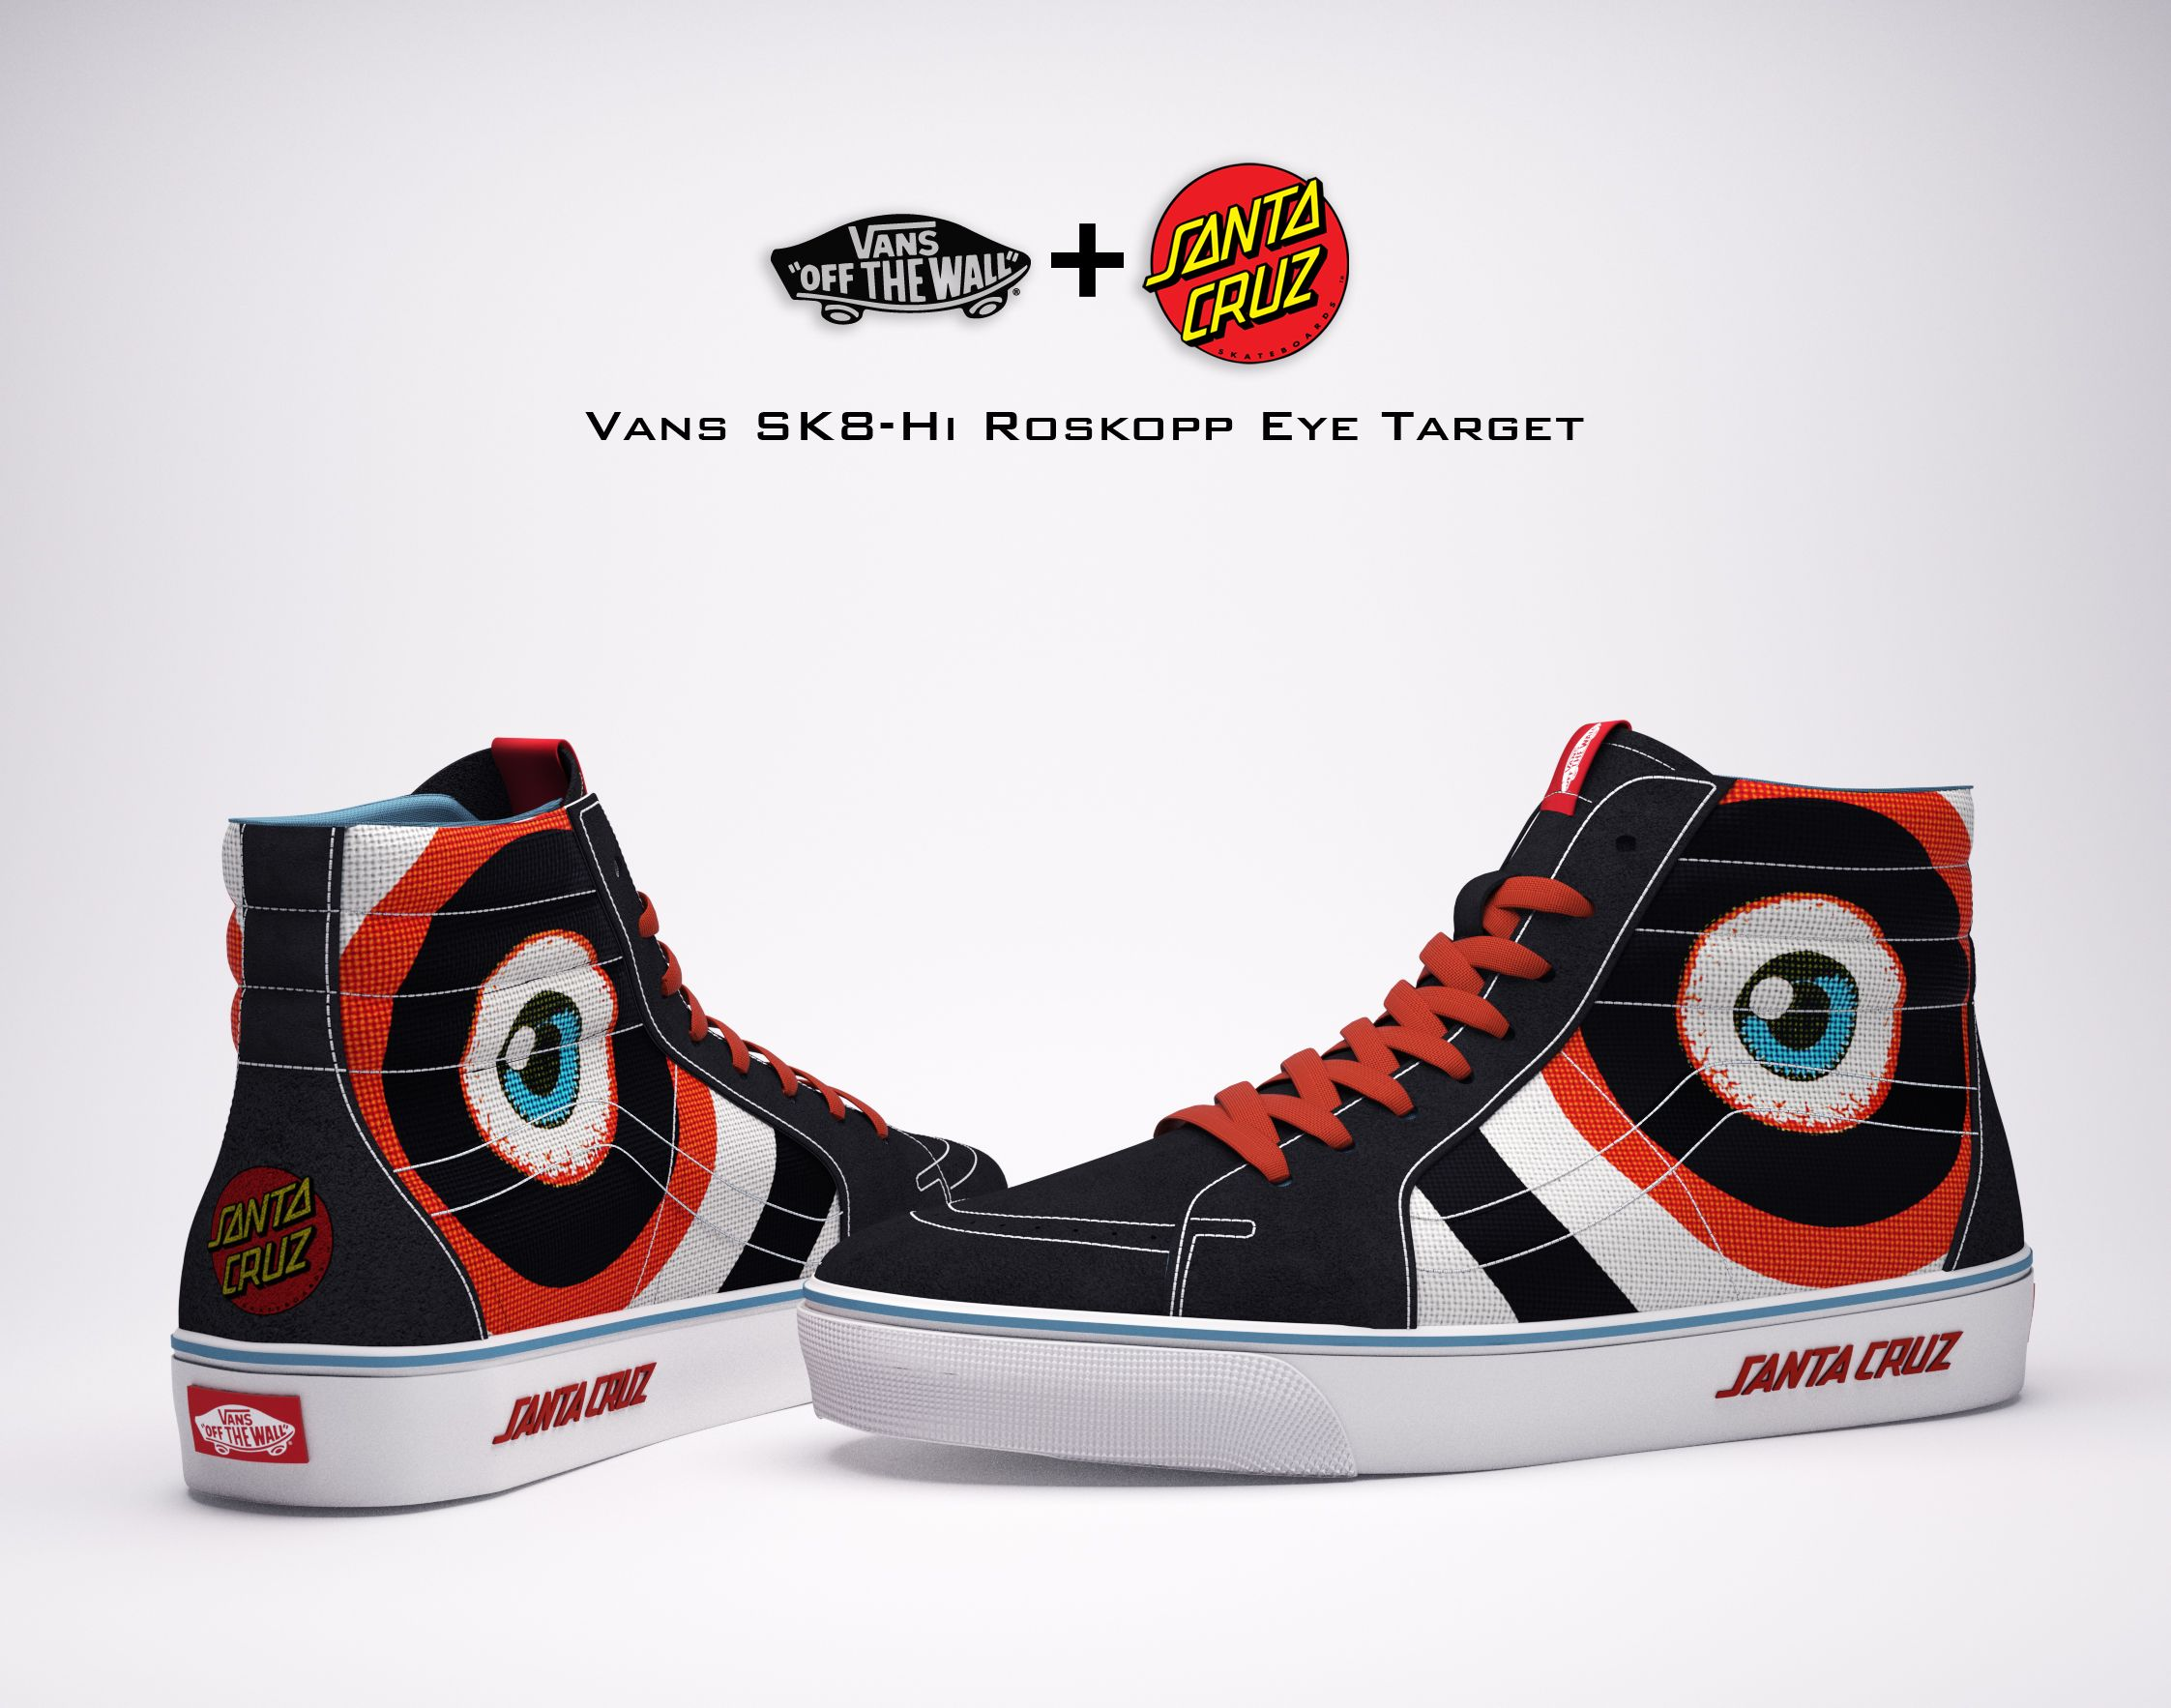 Vans & Santa Cruz Skateboards Collaboration on Behance